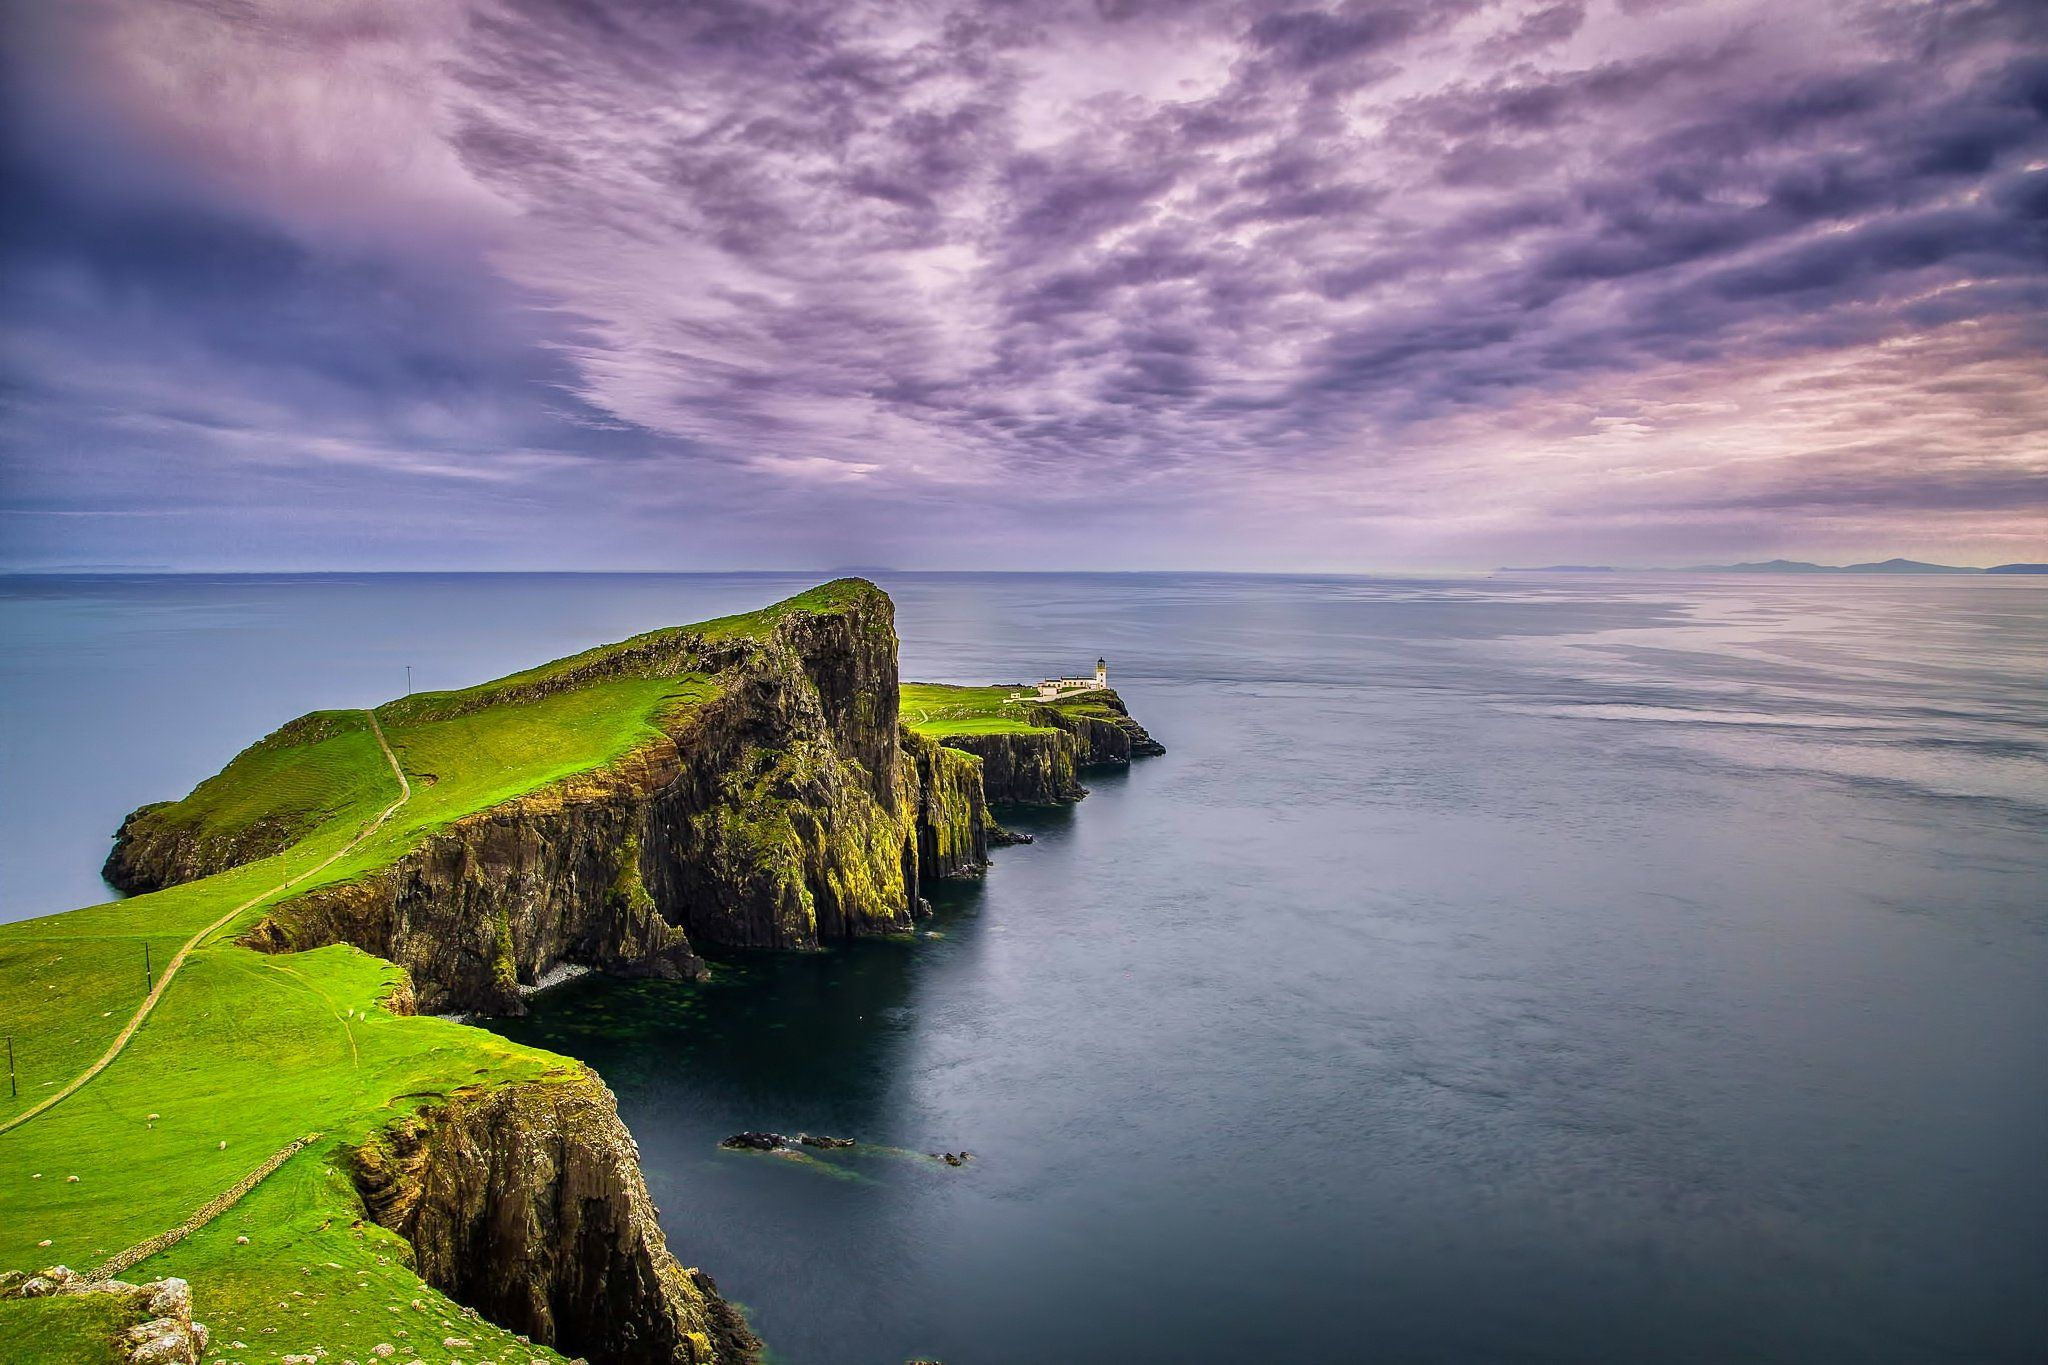 Cool Coast Lighthouse Scotland Hd Desktop Wallpaper Instagram Photo Background Image Nature Wallpaper Nature Wallpaper Pictures